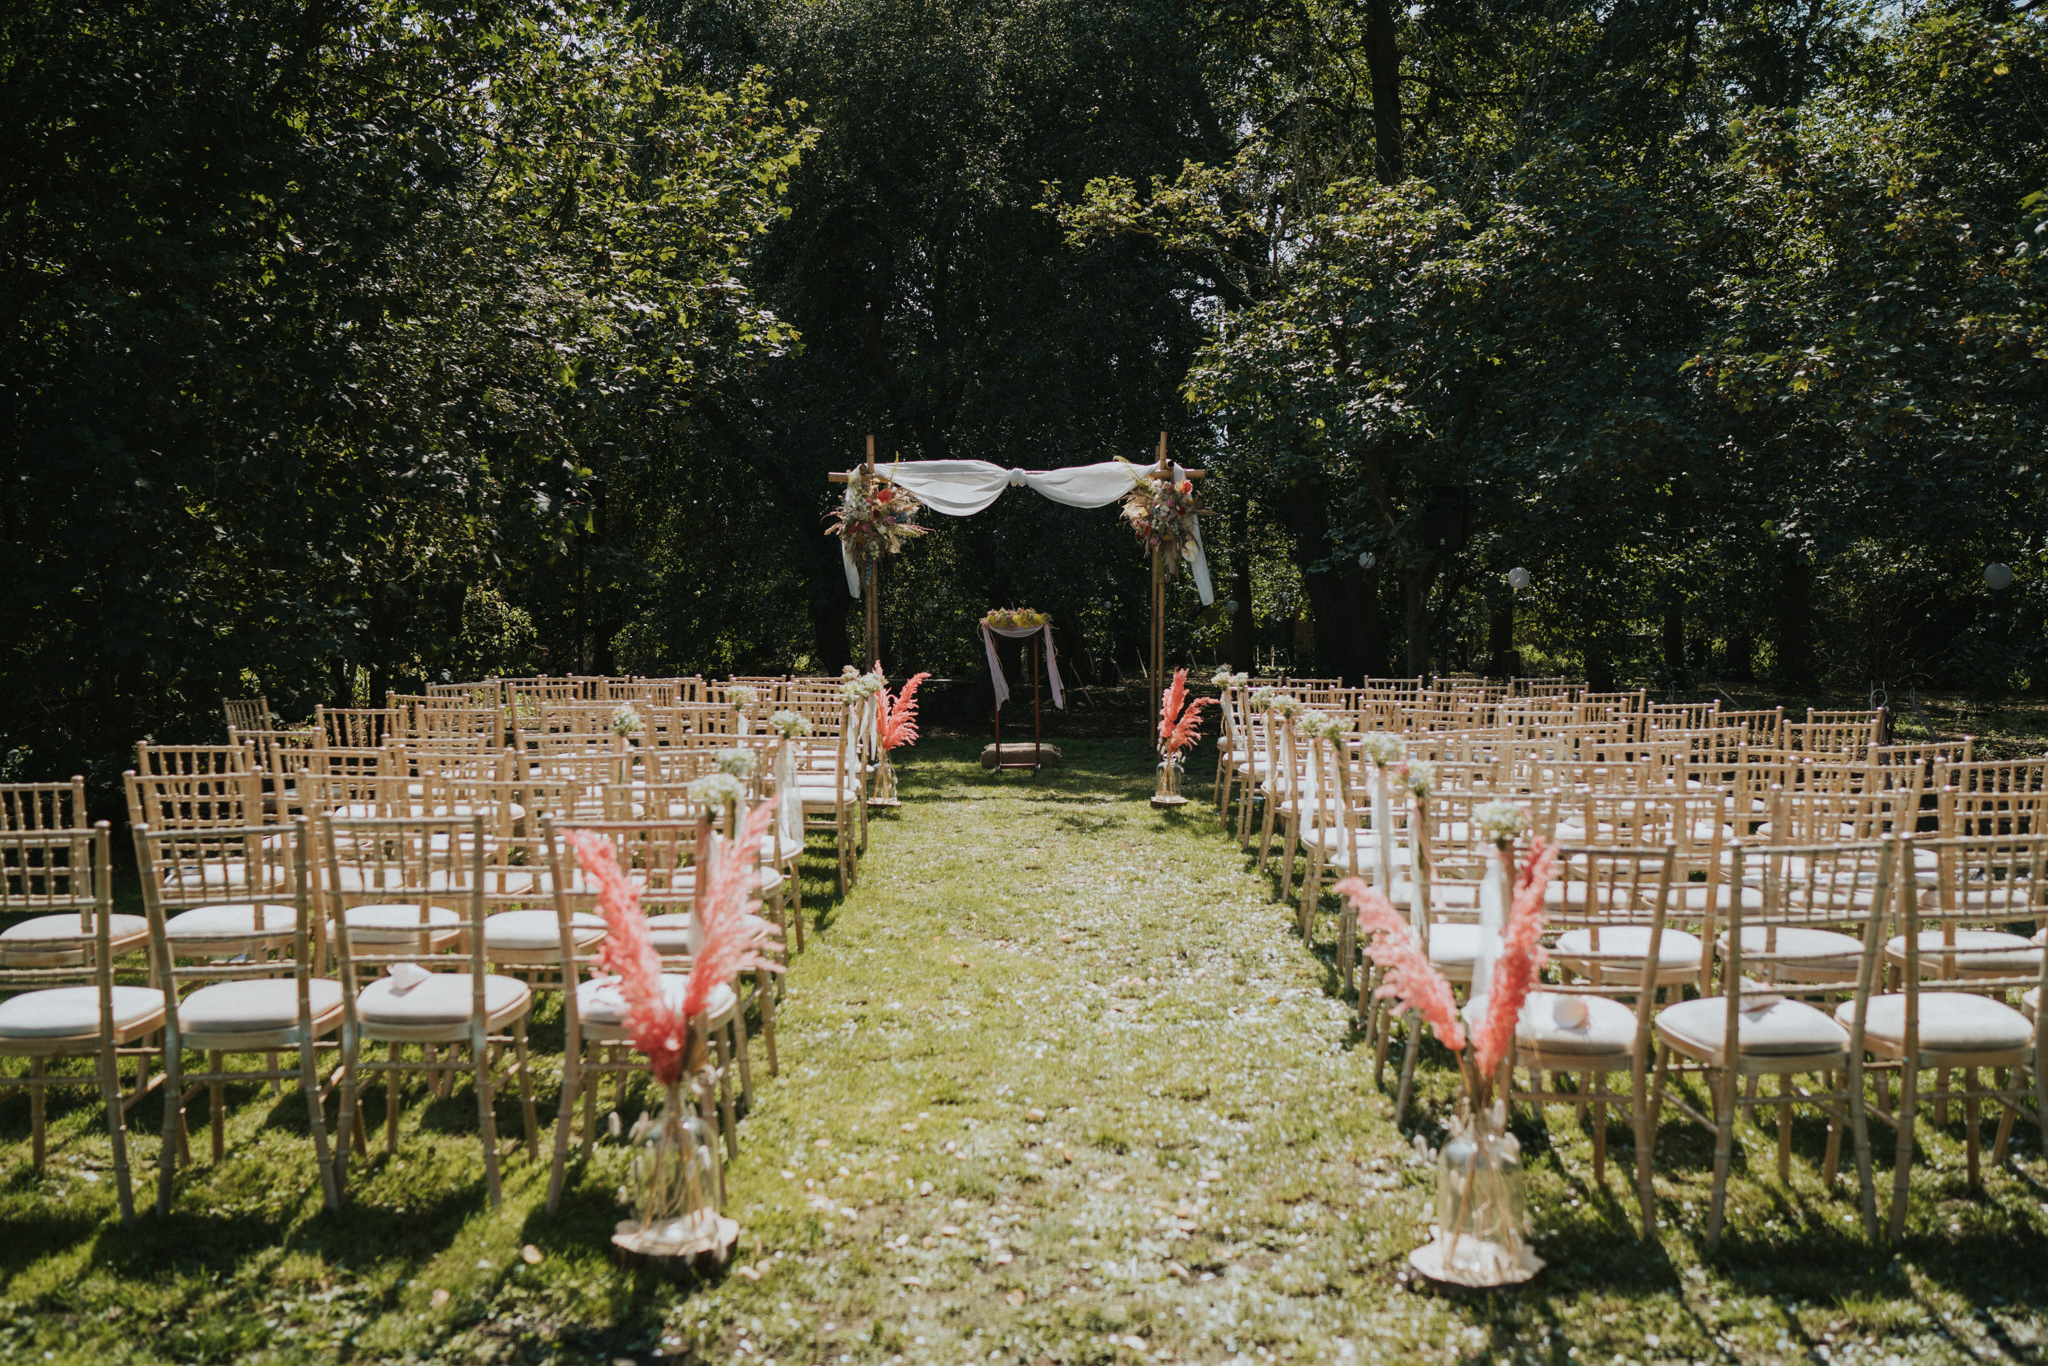 emi-Jack-boho-diy-wedding-eggington-house-grace-elizabeth-colchester-essex-alternative-wedding-photographer-suffolk-norfolk-devon (20 of 56).jpg